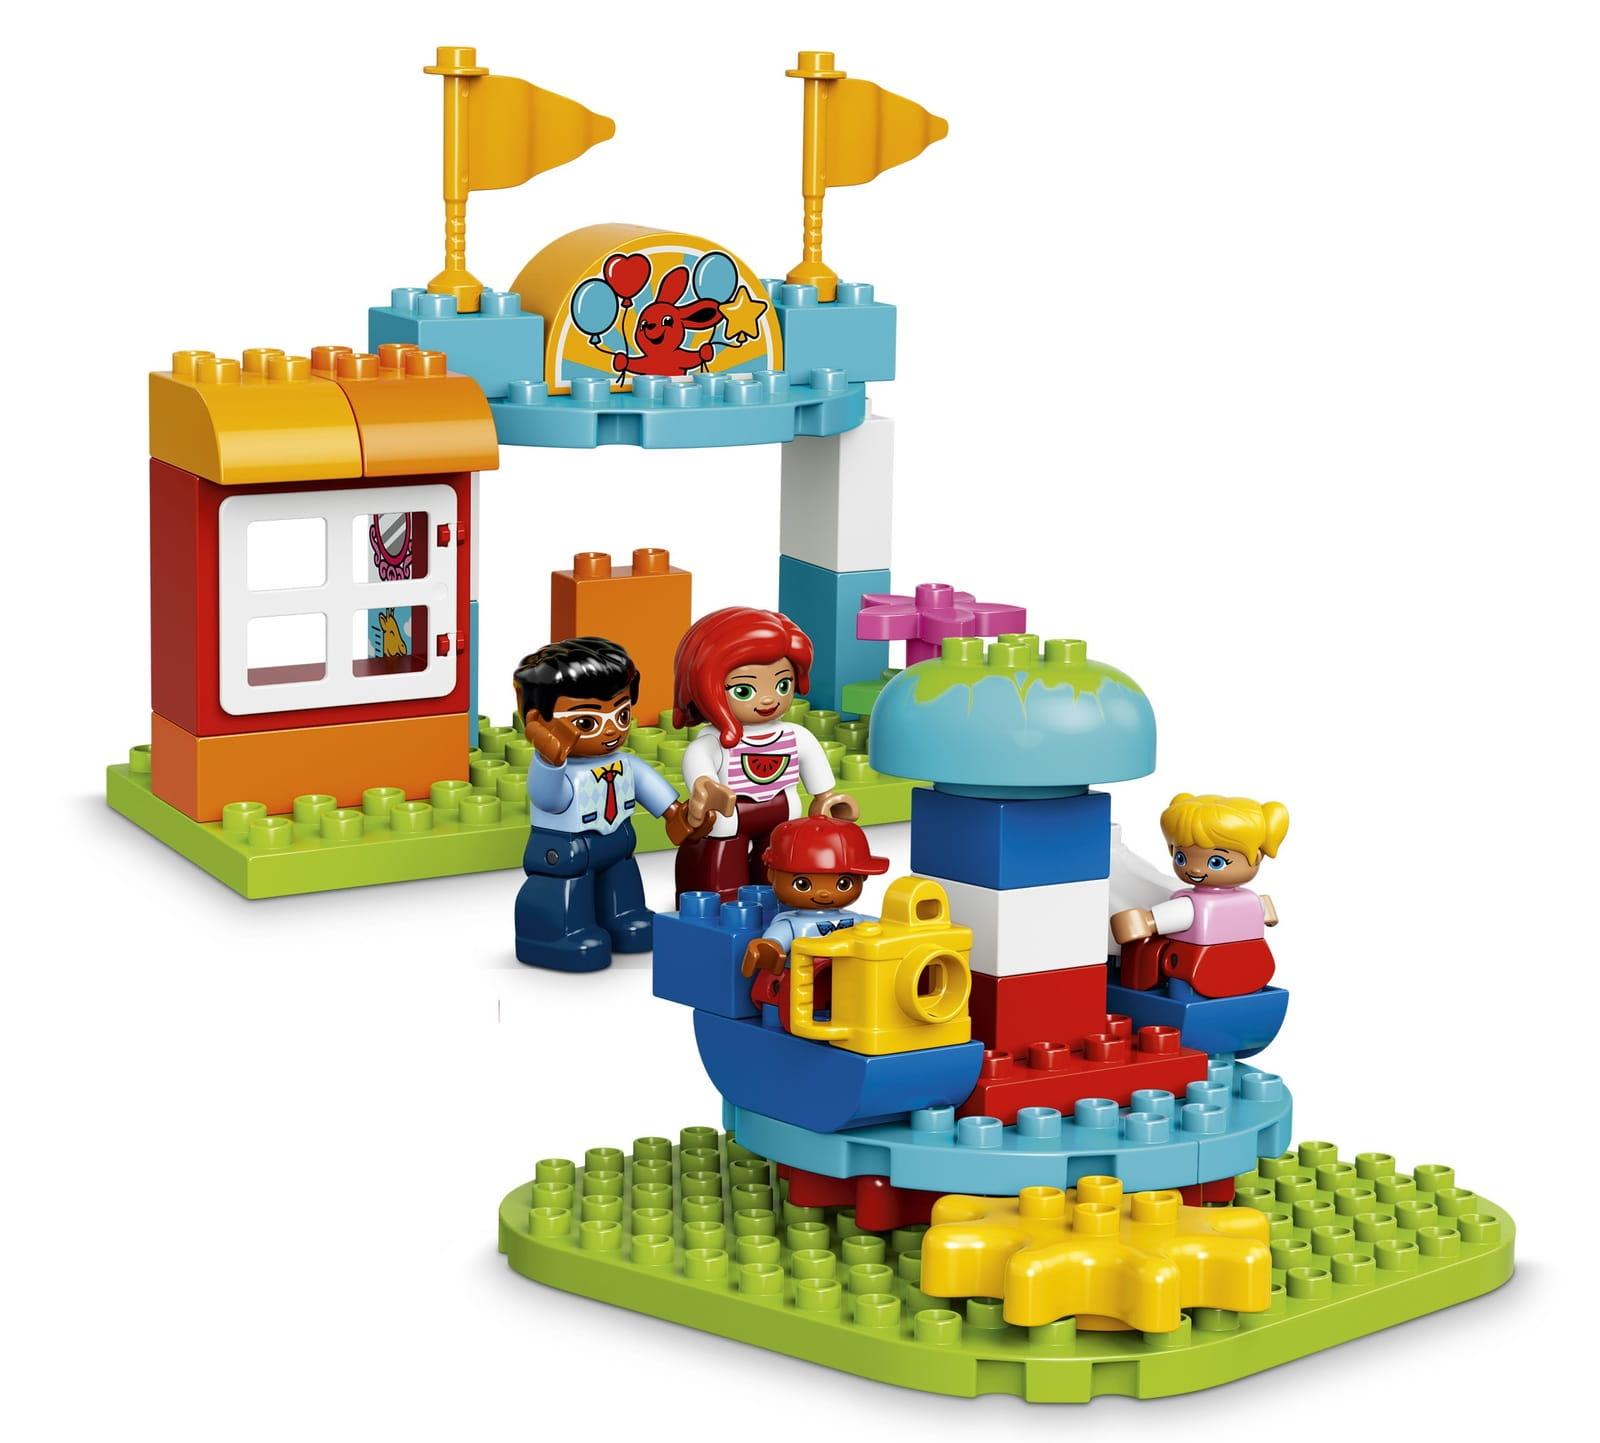 Klocki Lego 10841 Duplo Wesołe Miasteczko Httpbricktoyspl